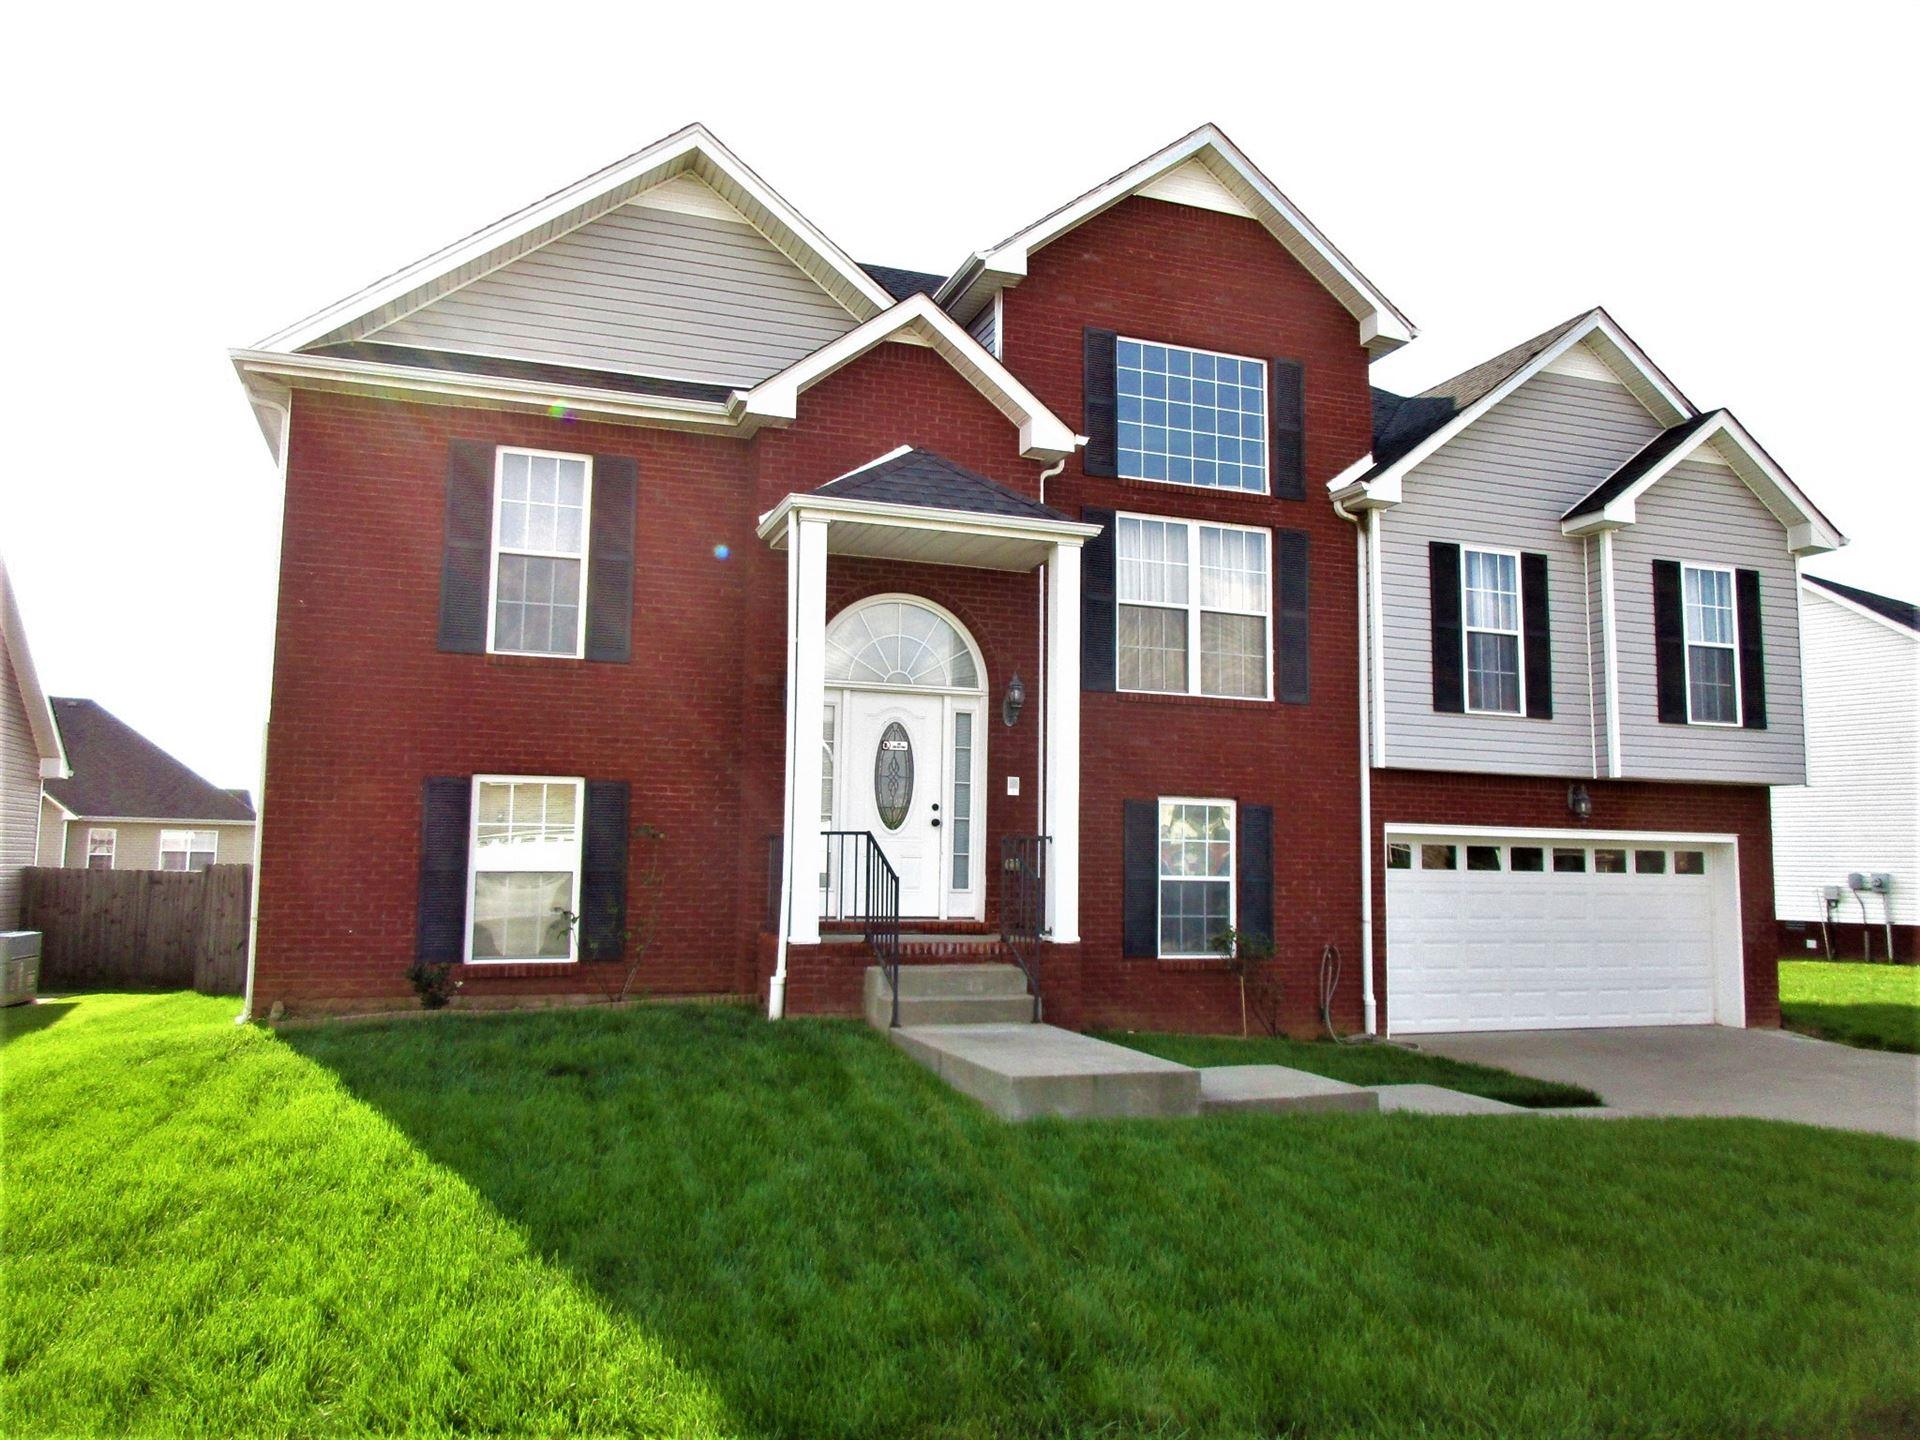 1012 Chardea Dr, Clarksville, TN 37040 - MLS#: 2262495